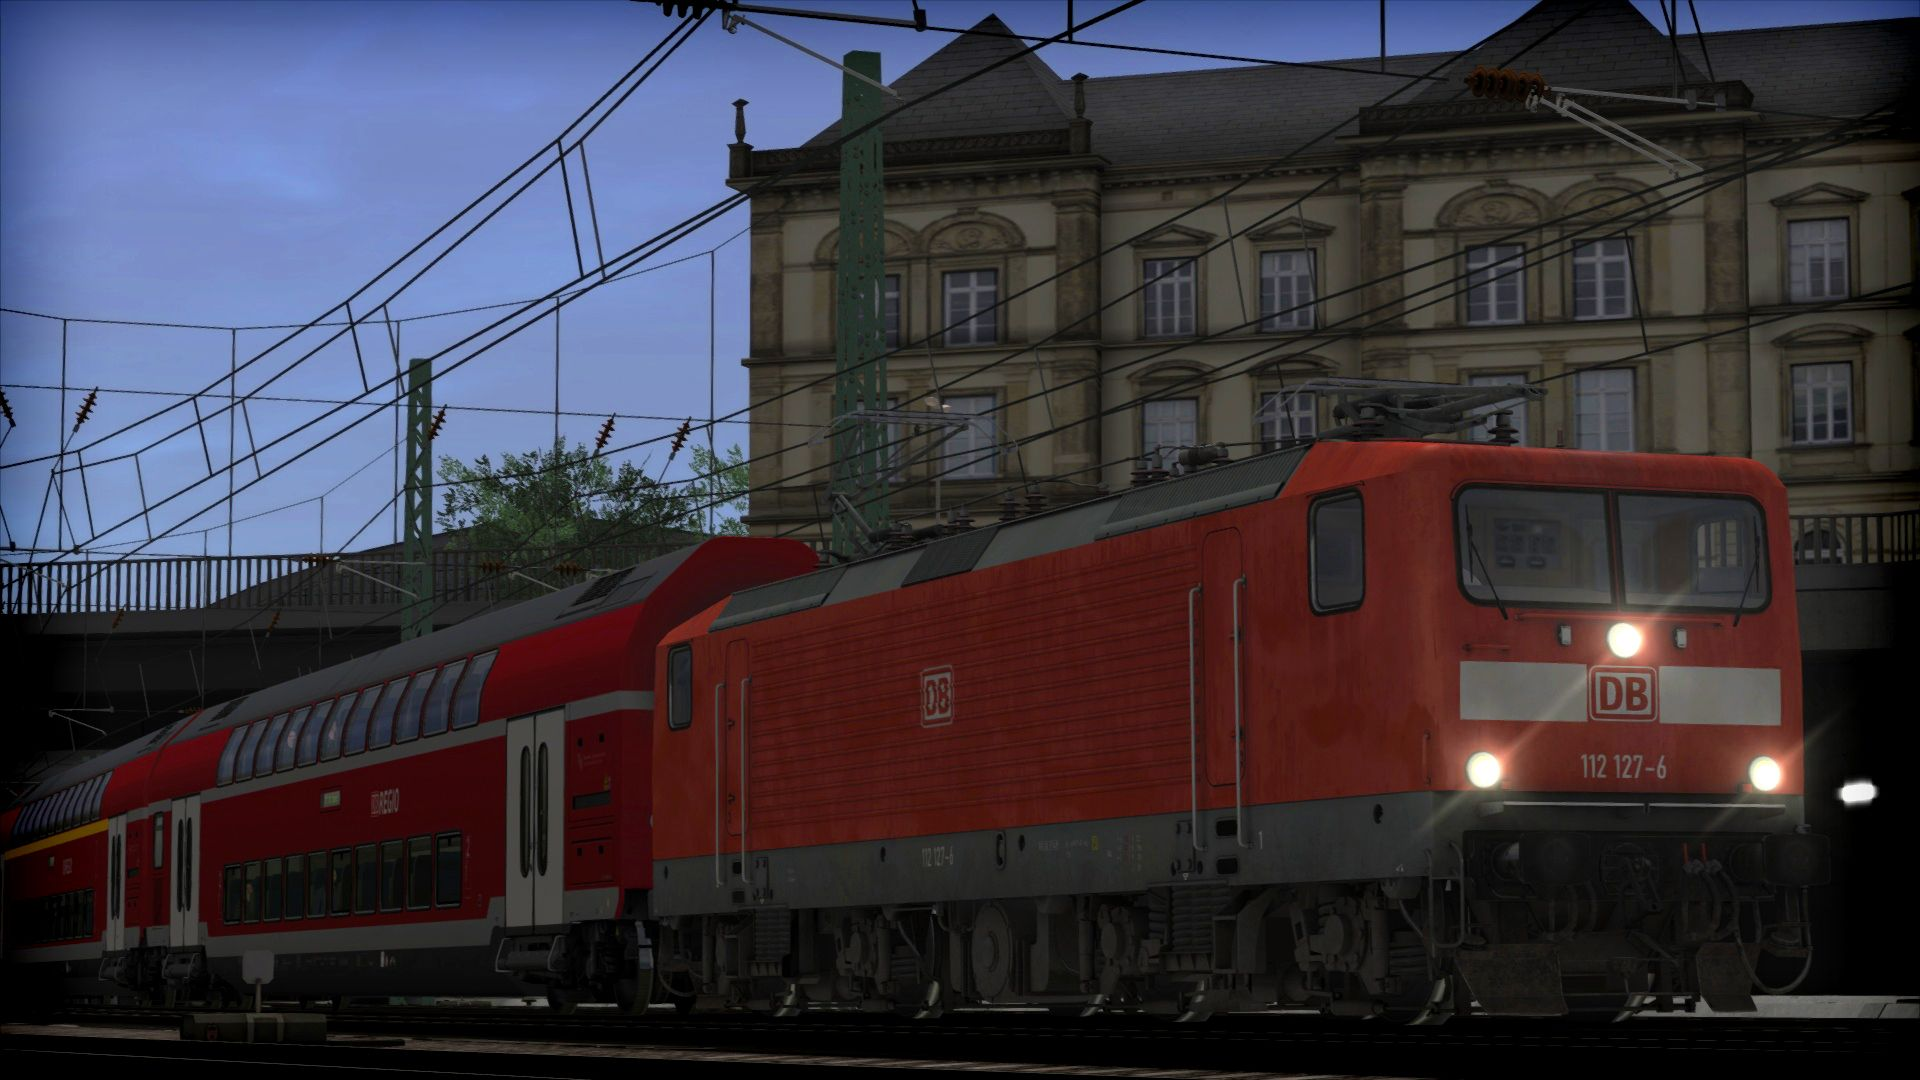 BR1121